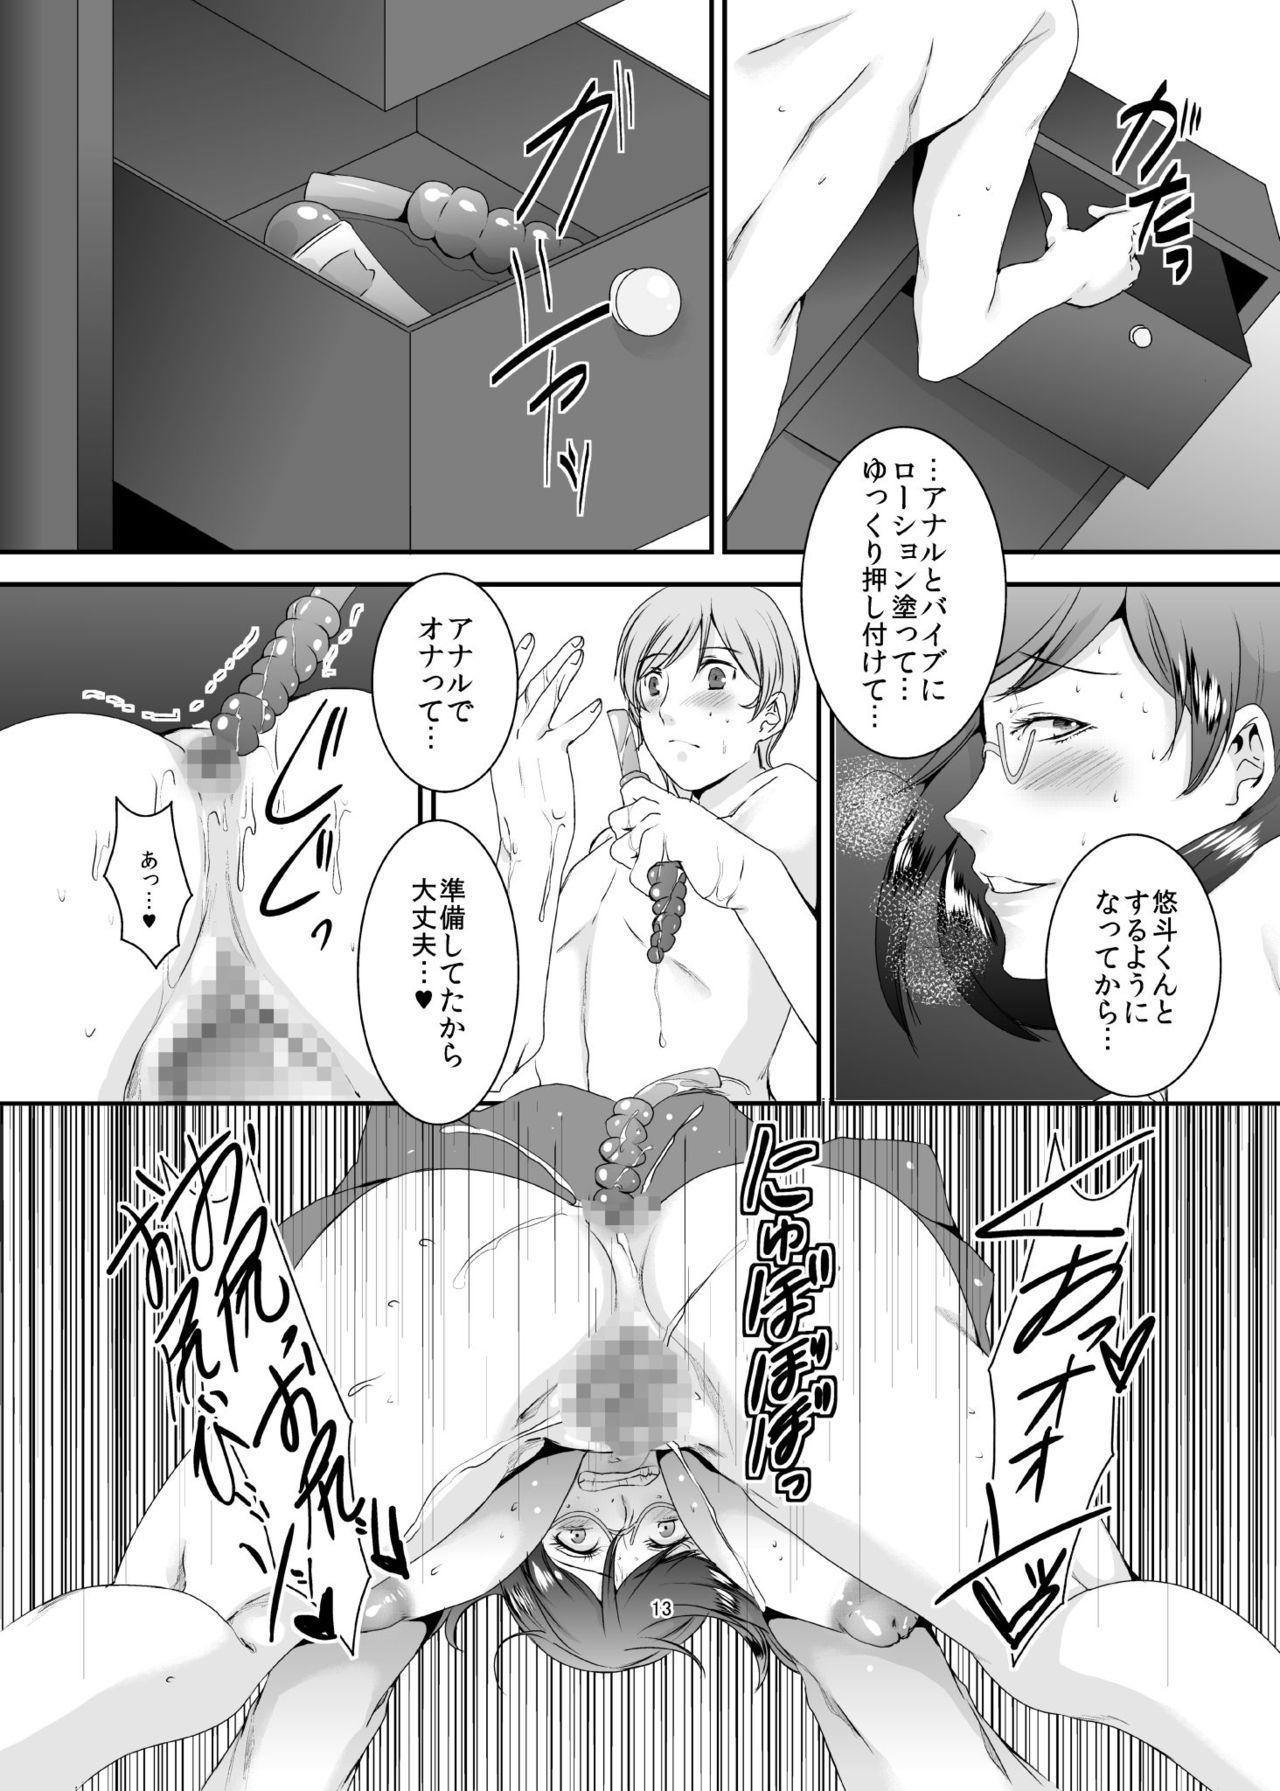 [Sprechchor (Eguchi Chibi)] Oku-sama wa Moto Yariman -Besluted- 5 [Digital] 13